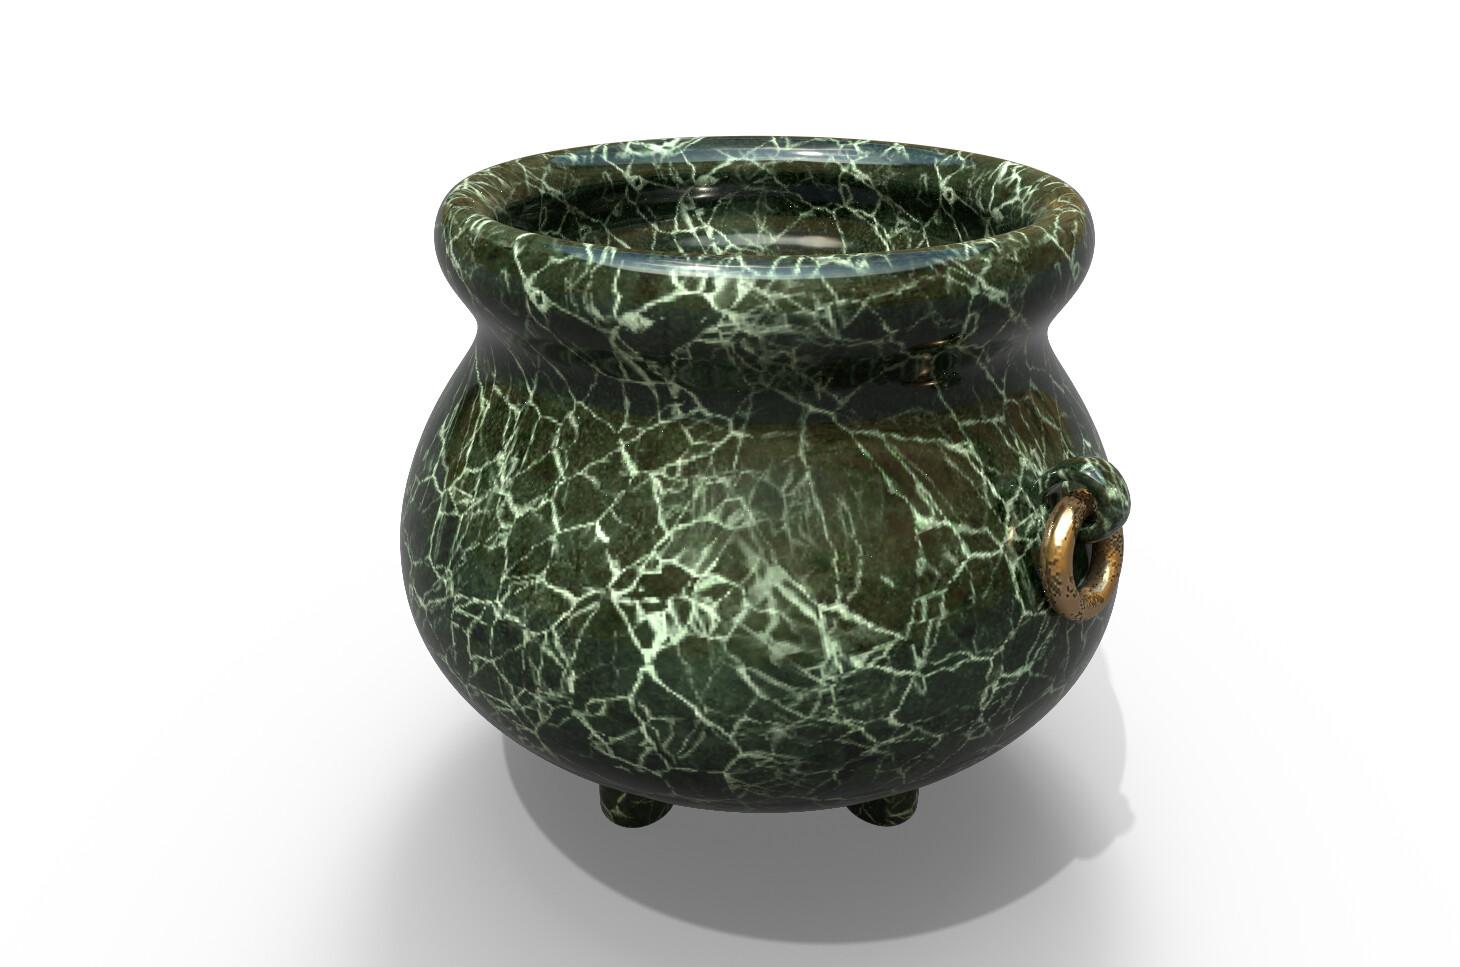 Joseph moniz cauldron001g